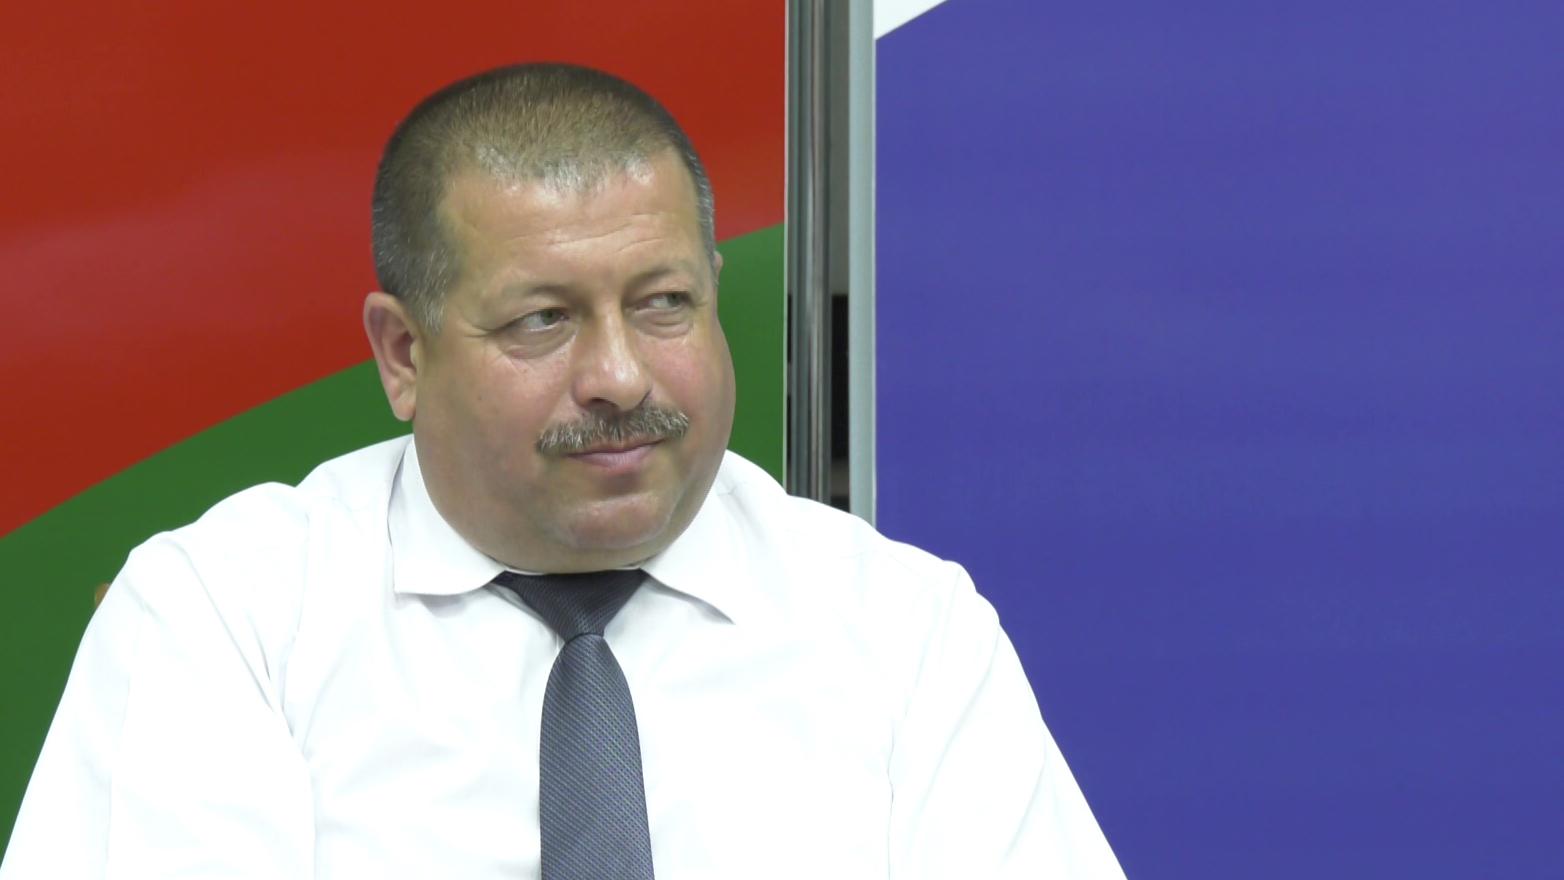 linevich - Анатолий Линевич разбирался с проблемами жителей в Ушачах (видео)